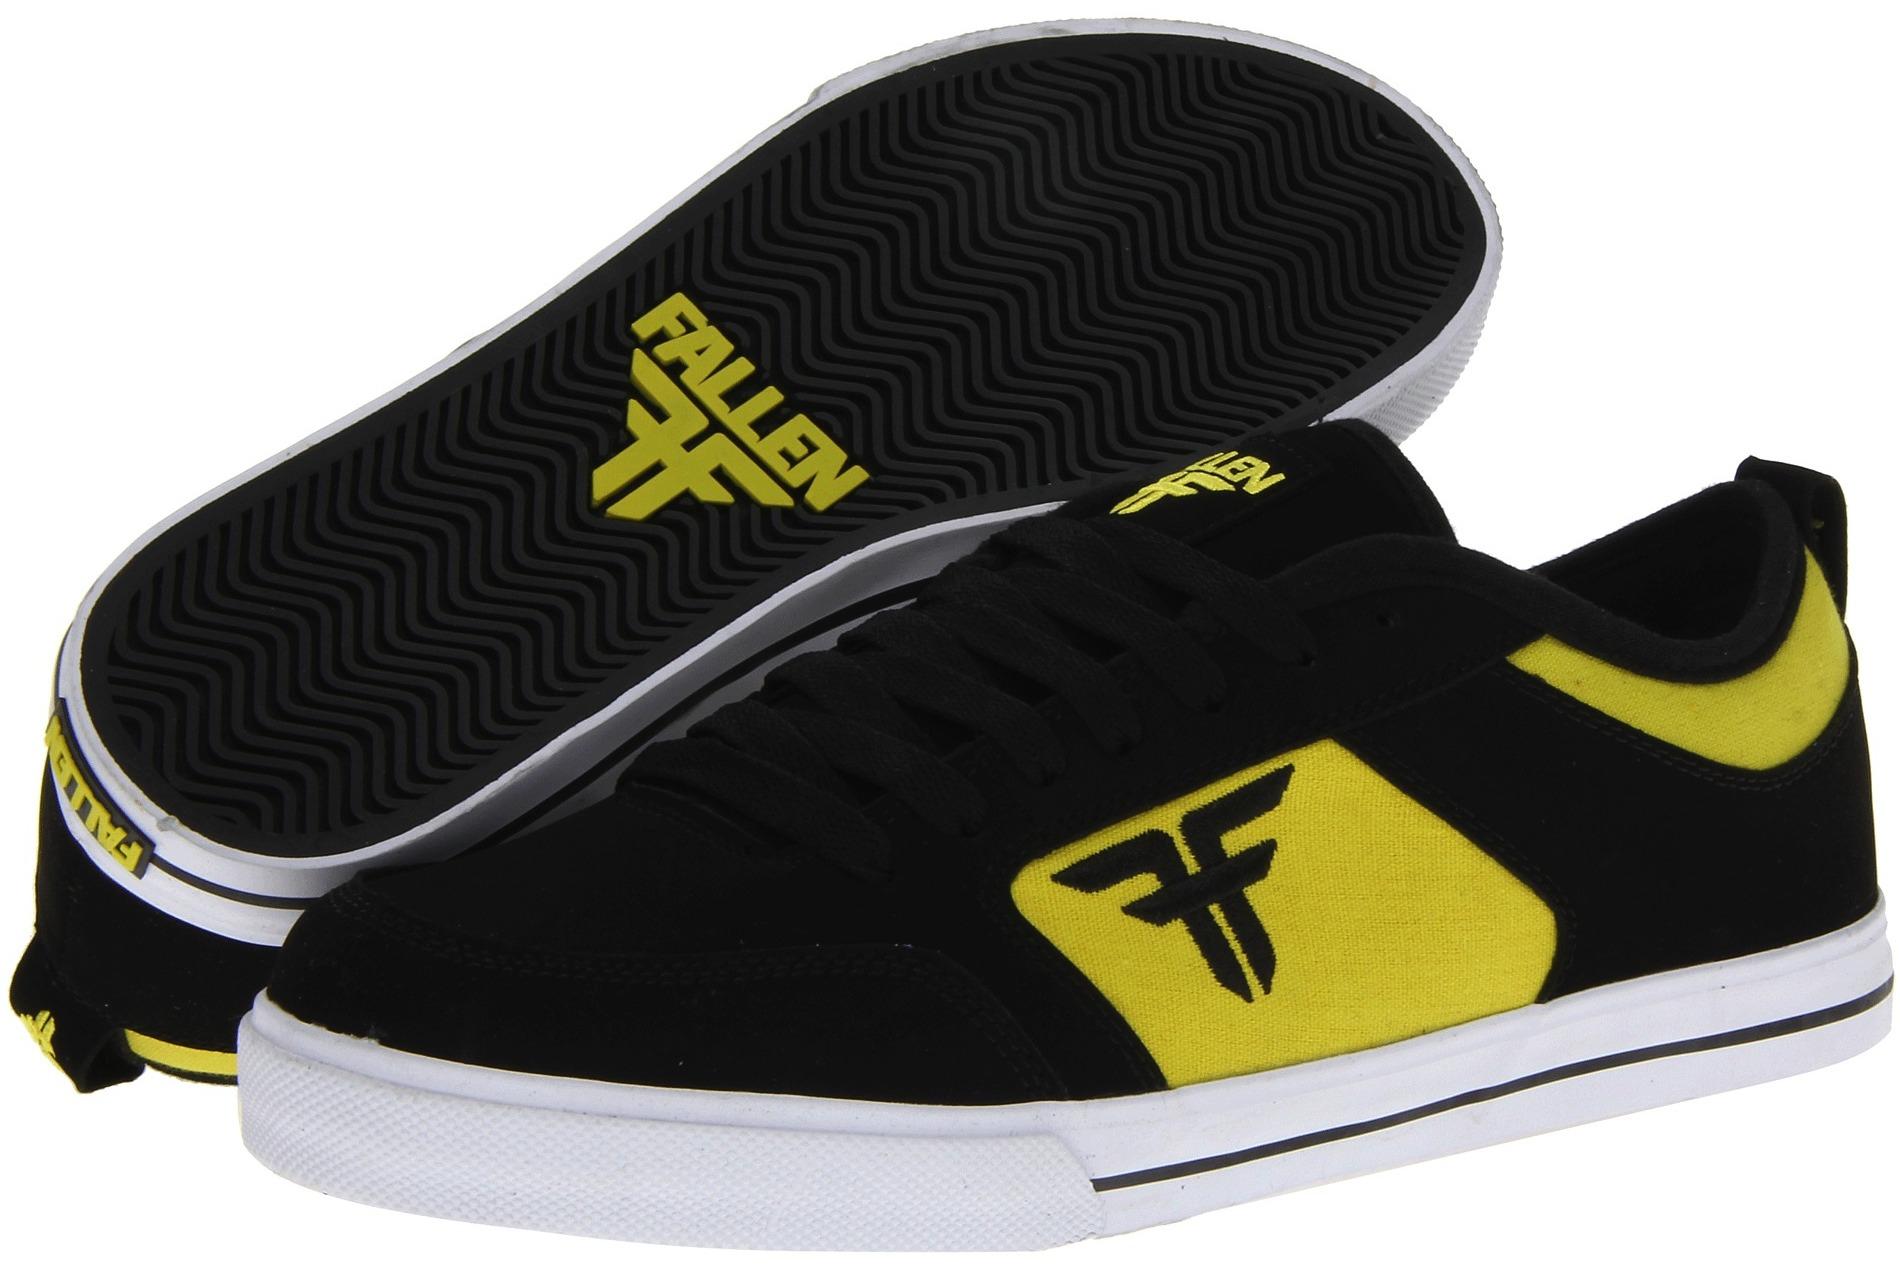 Fallen Clipper SE Vegan skateboard shoes